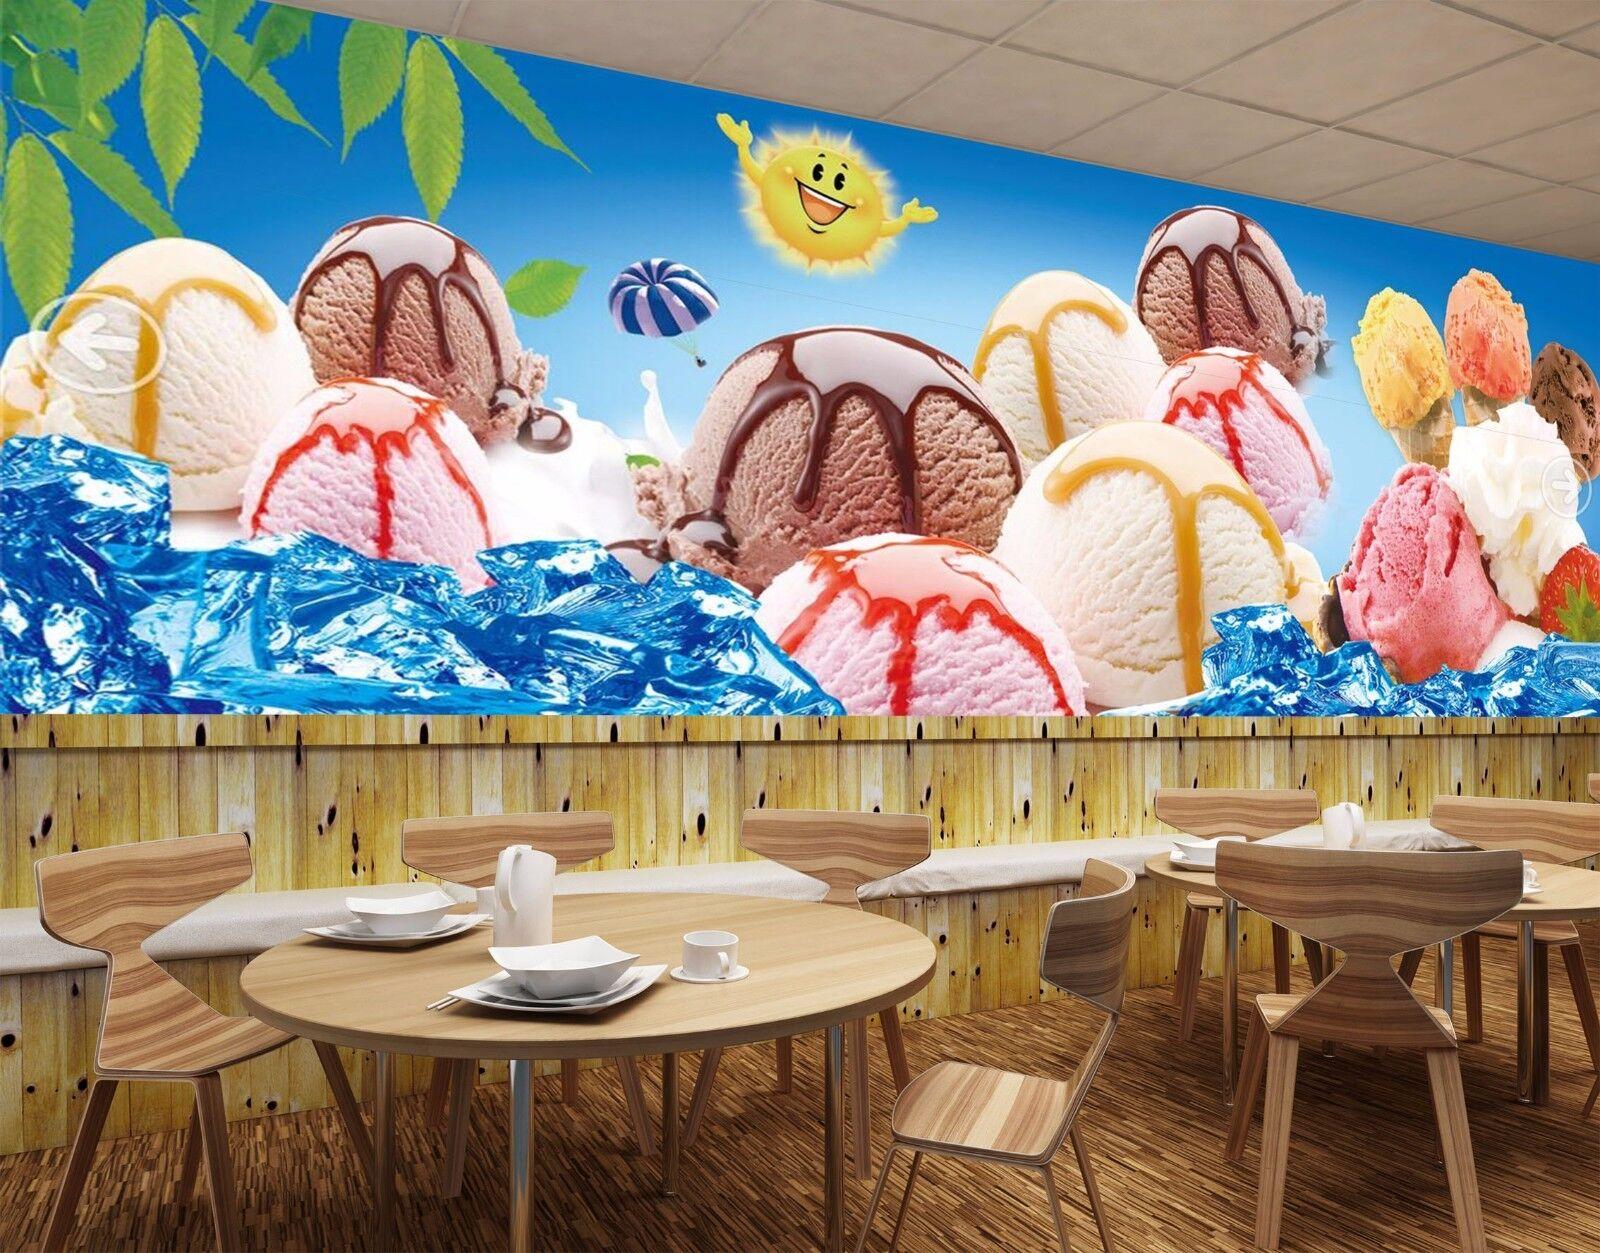 3D Ice Cream Balls 74 Wall Paper Murals Wall Print Wall Wallpaper Mural AU Kyra